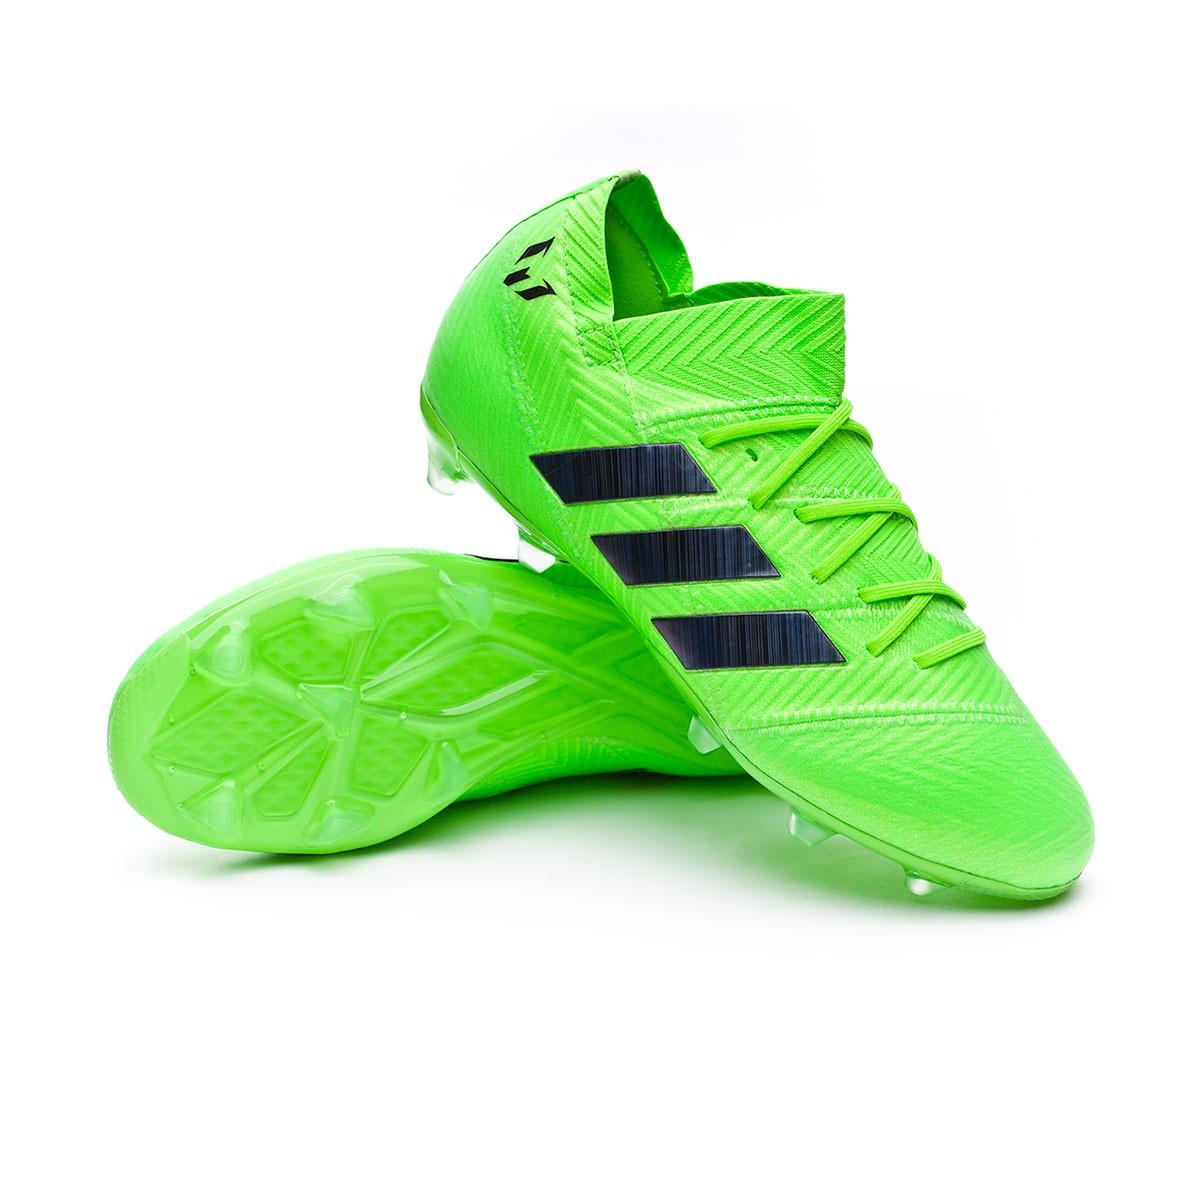 b108180e1eeb Football Boots adidas Kids Nemeziz Messi 18.1 FG Solar green-Black ...